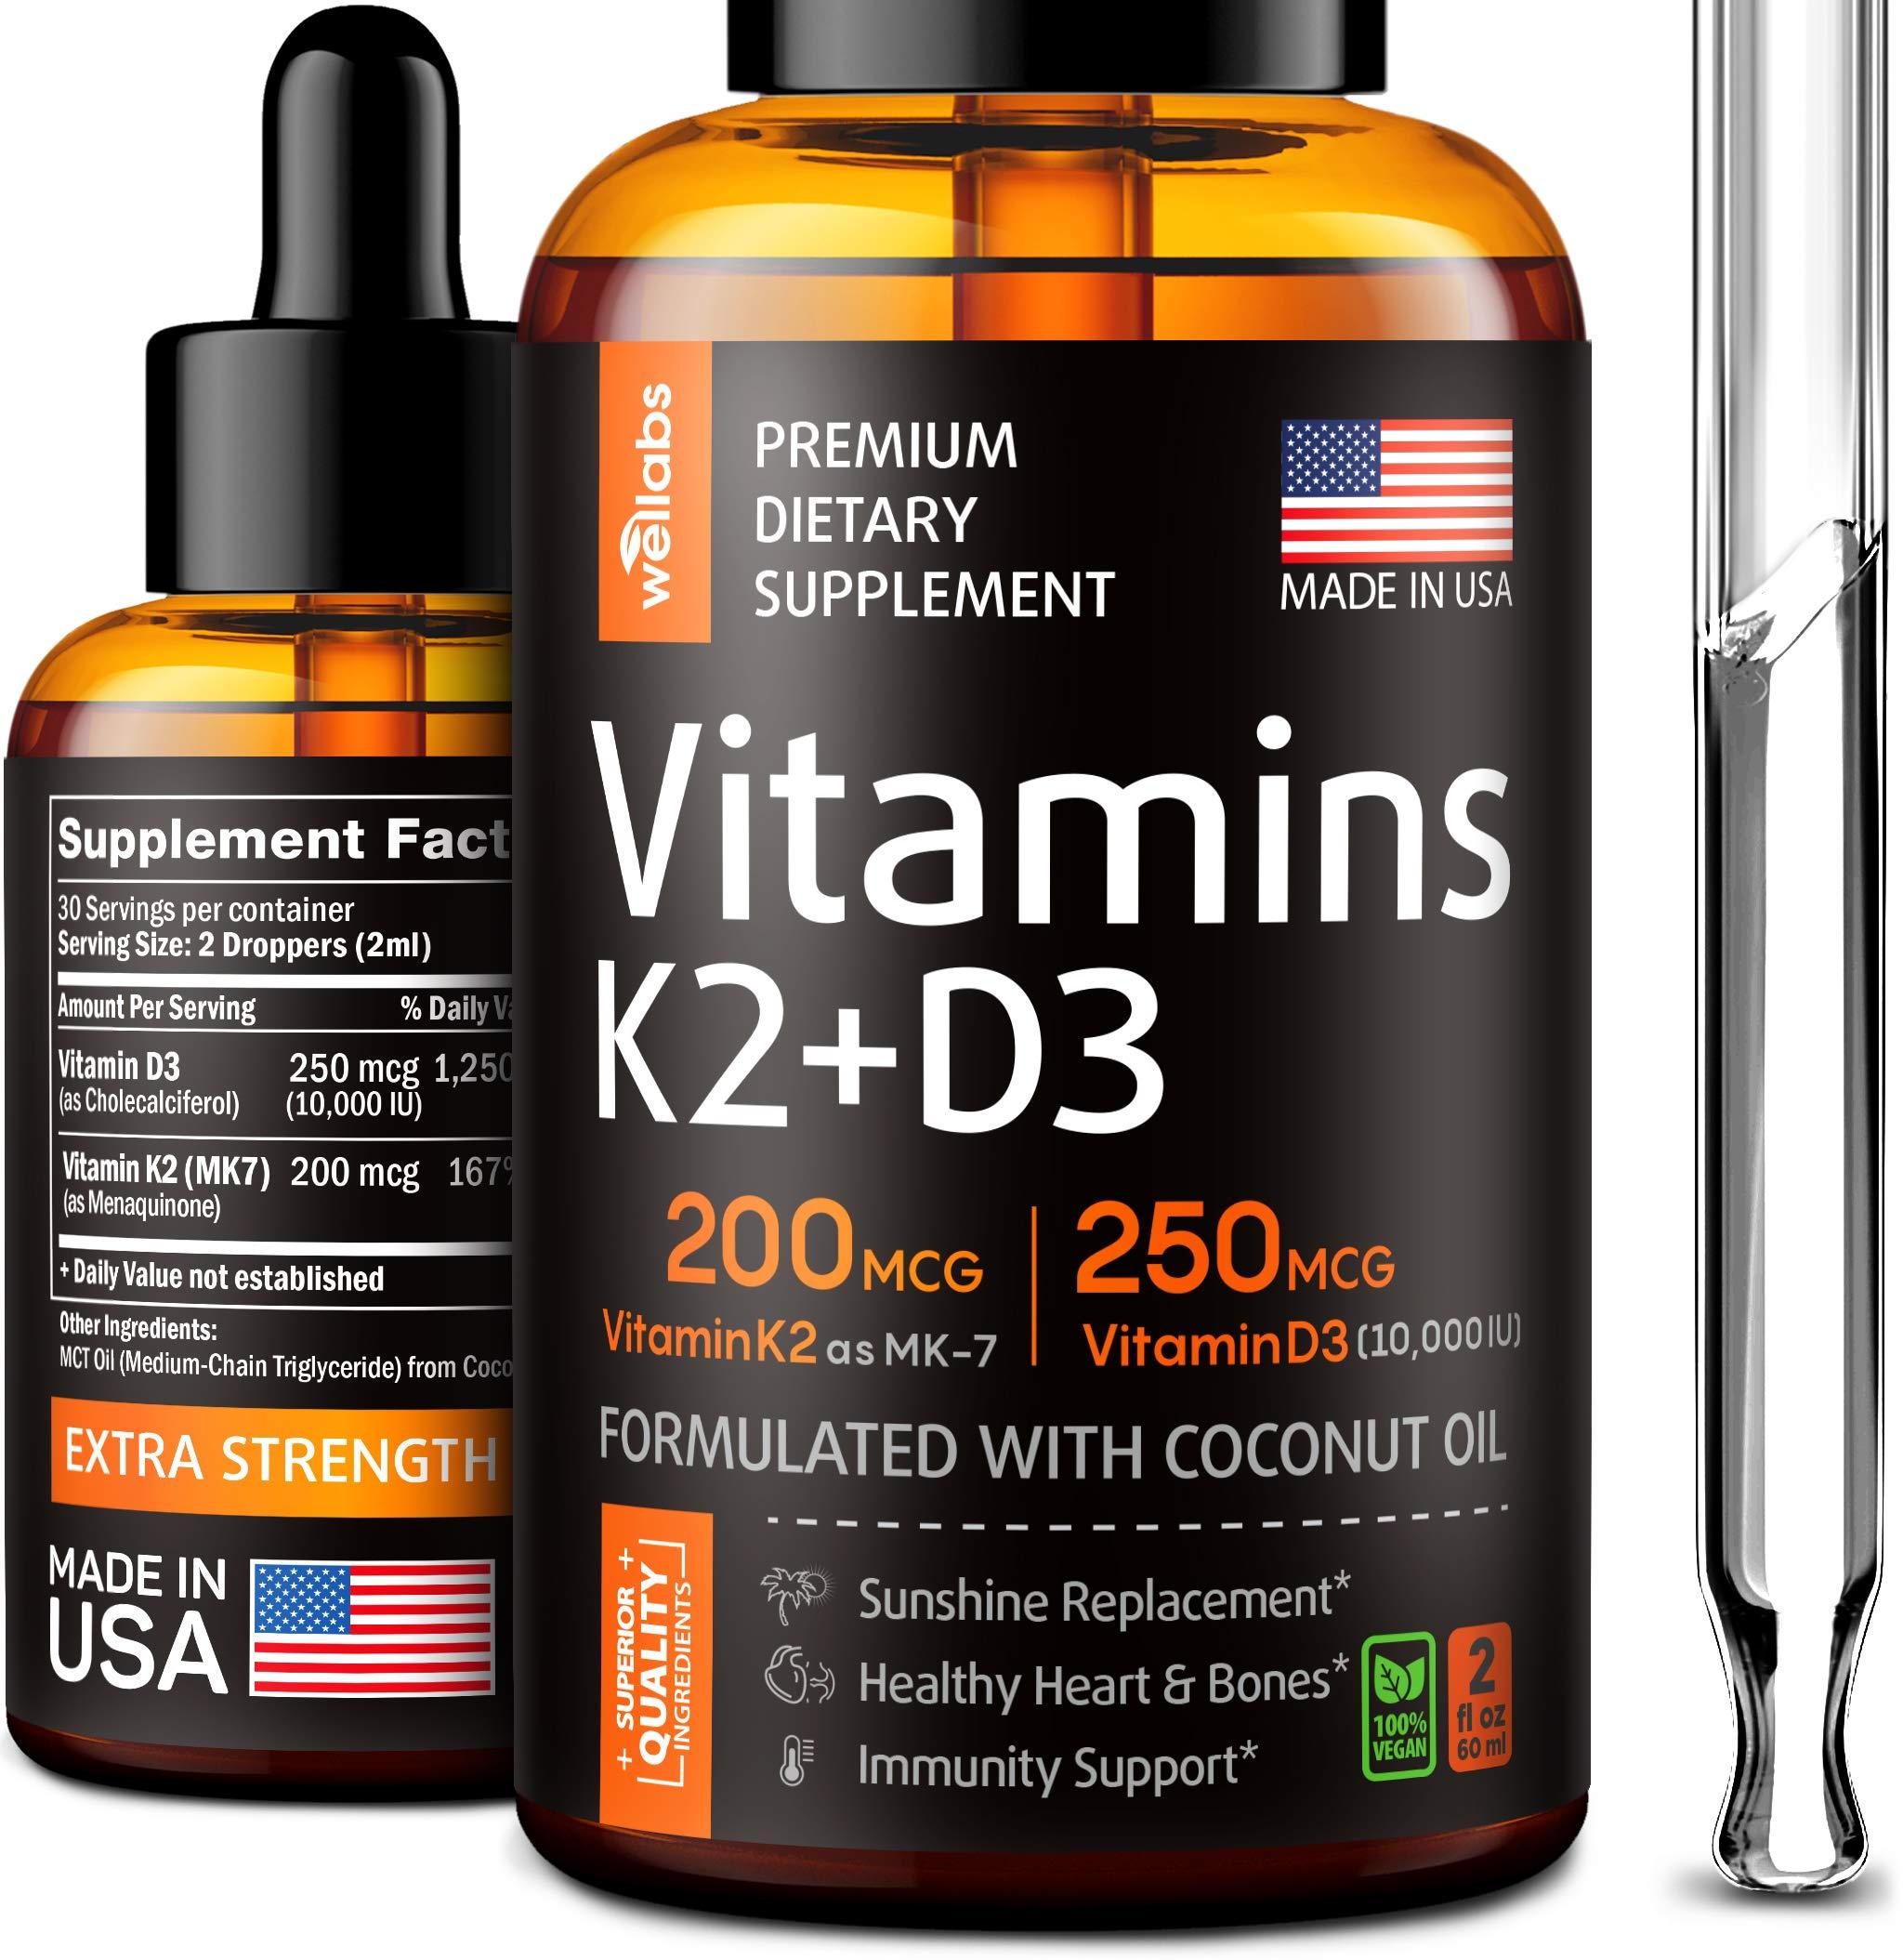 K2 & D3 Vitamin Supplement - Premium Immune Support - Liquid Vitamin D3 10000 IU - Made in The USA - Sublingual Vitamin D3 & K2 for Heart & Bone Health - The Sunshine D3 & K2 Vitamins